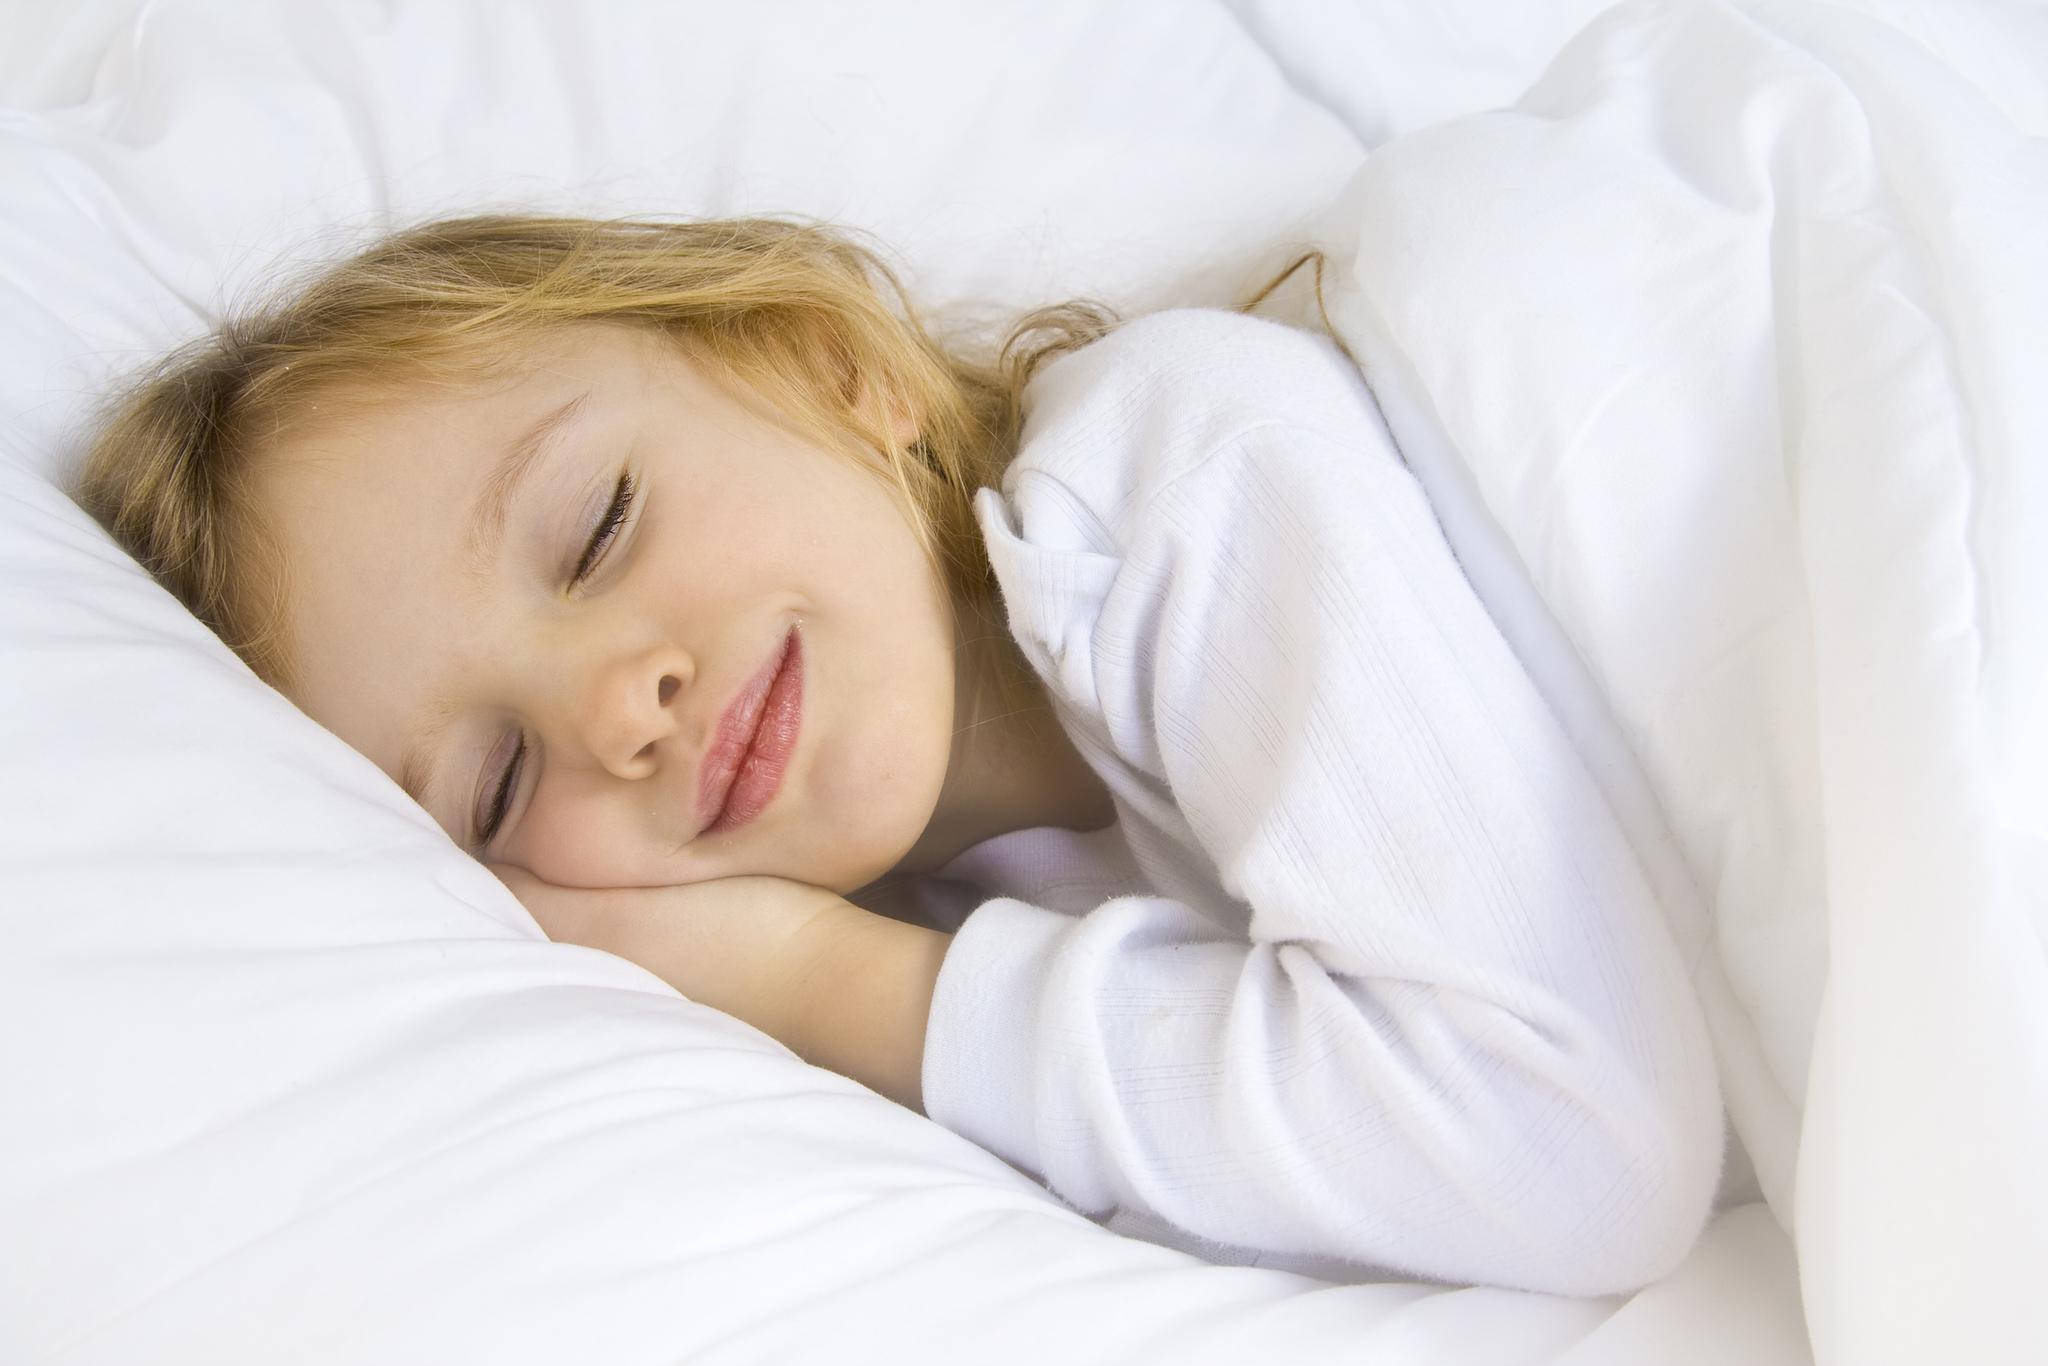 خطرات خوابیدن هنگام غروب آفتاب